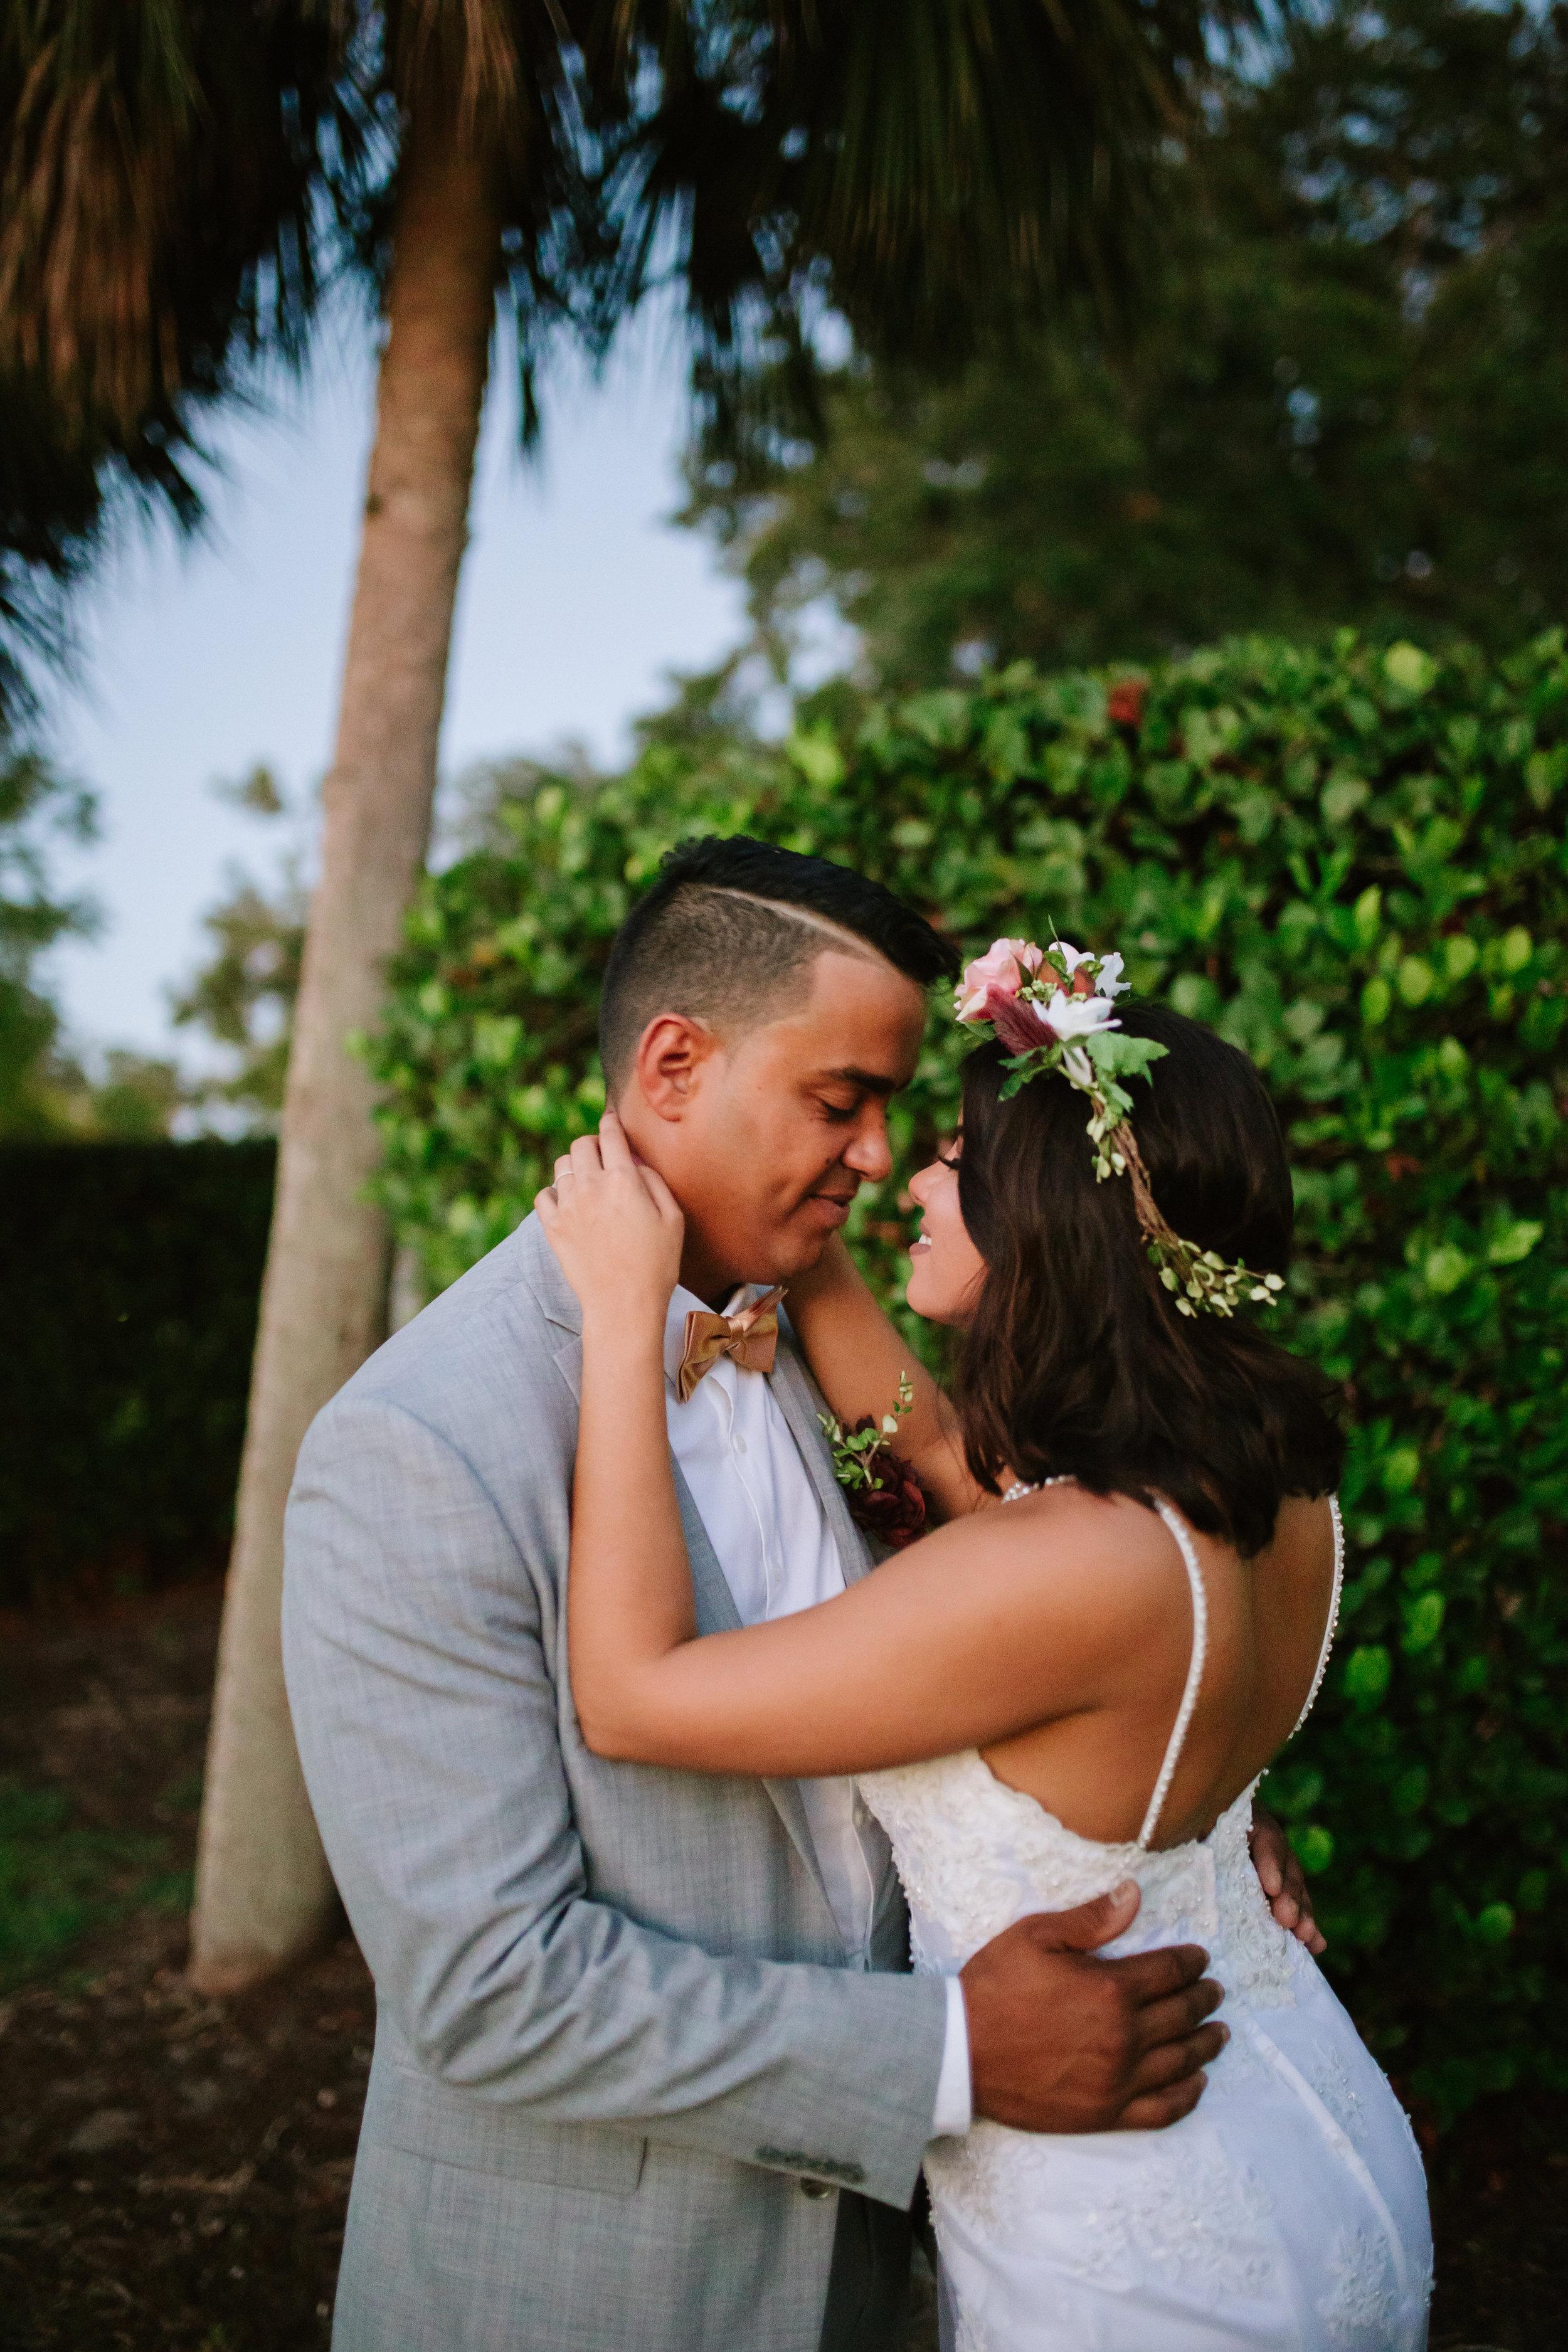 2017.05.23 Barbara and Mauricio Sales Port St Lucie Wedding (512 of 772).jpg